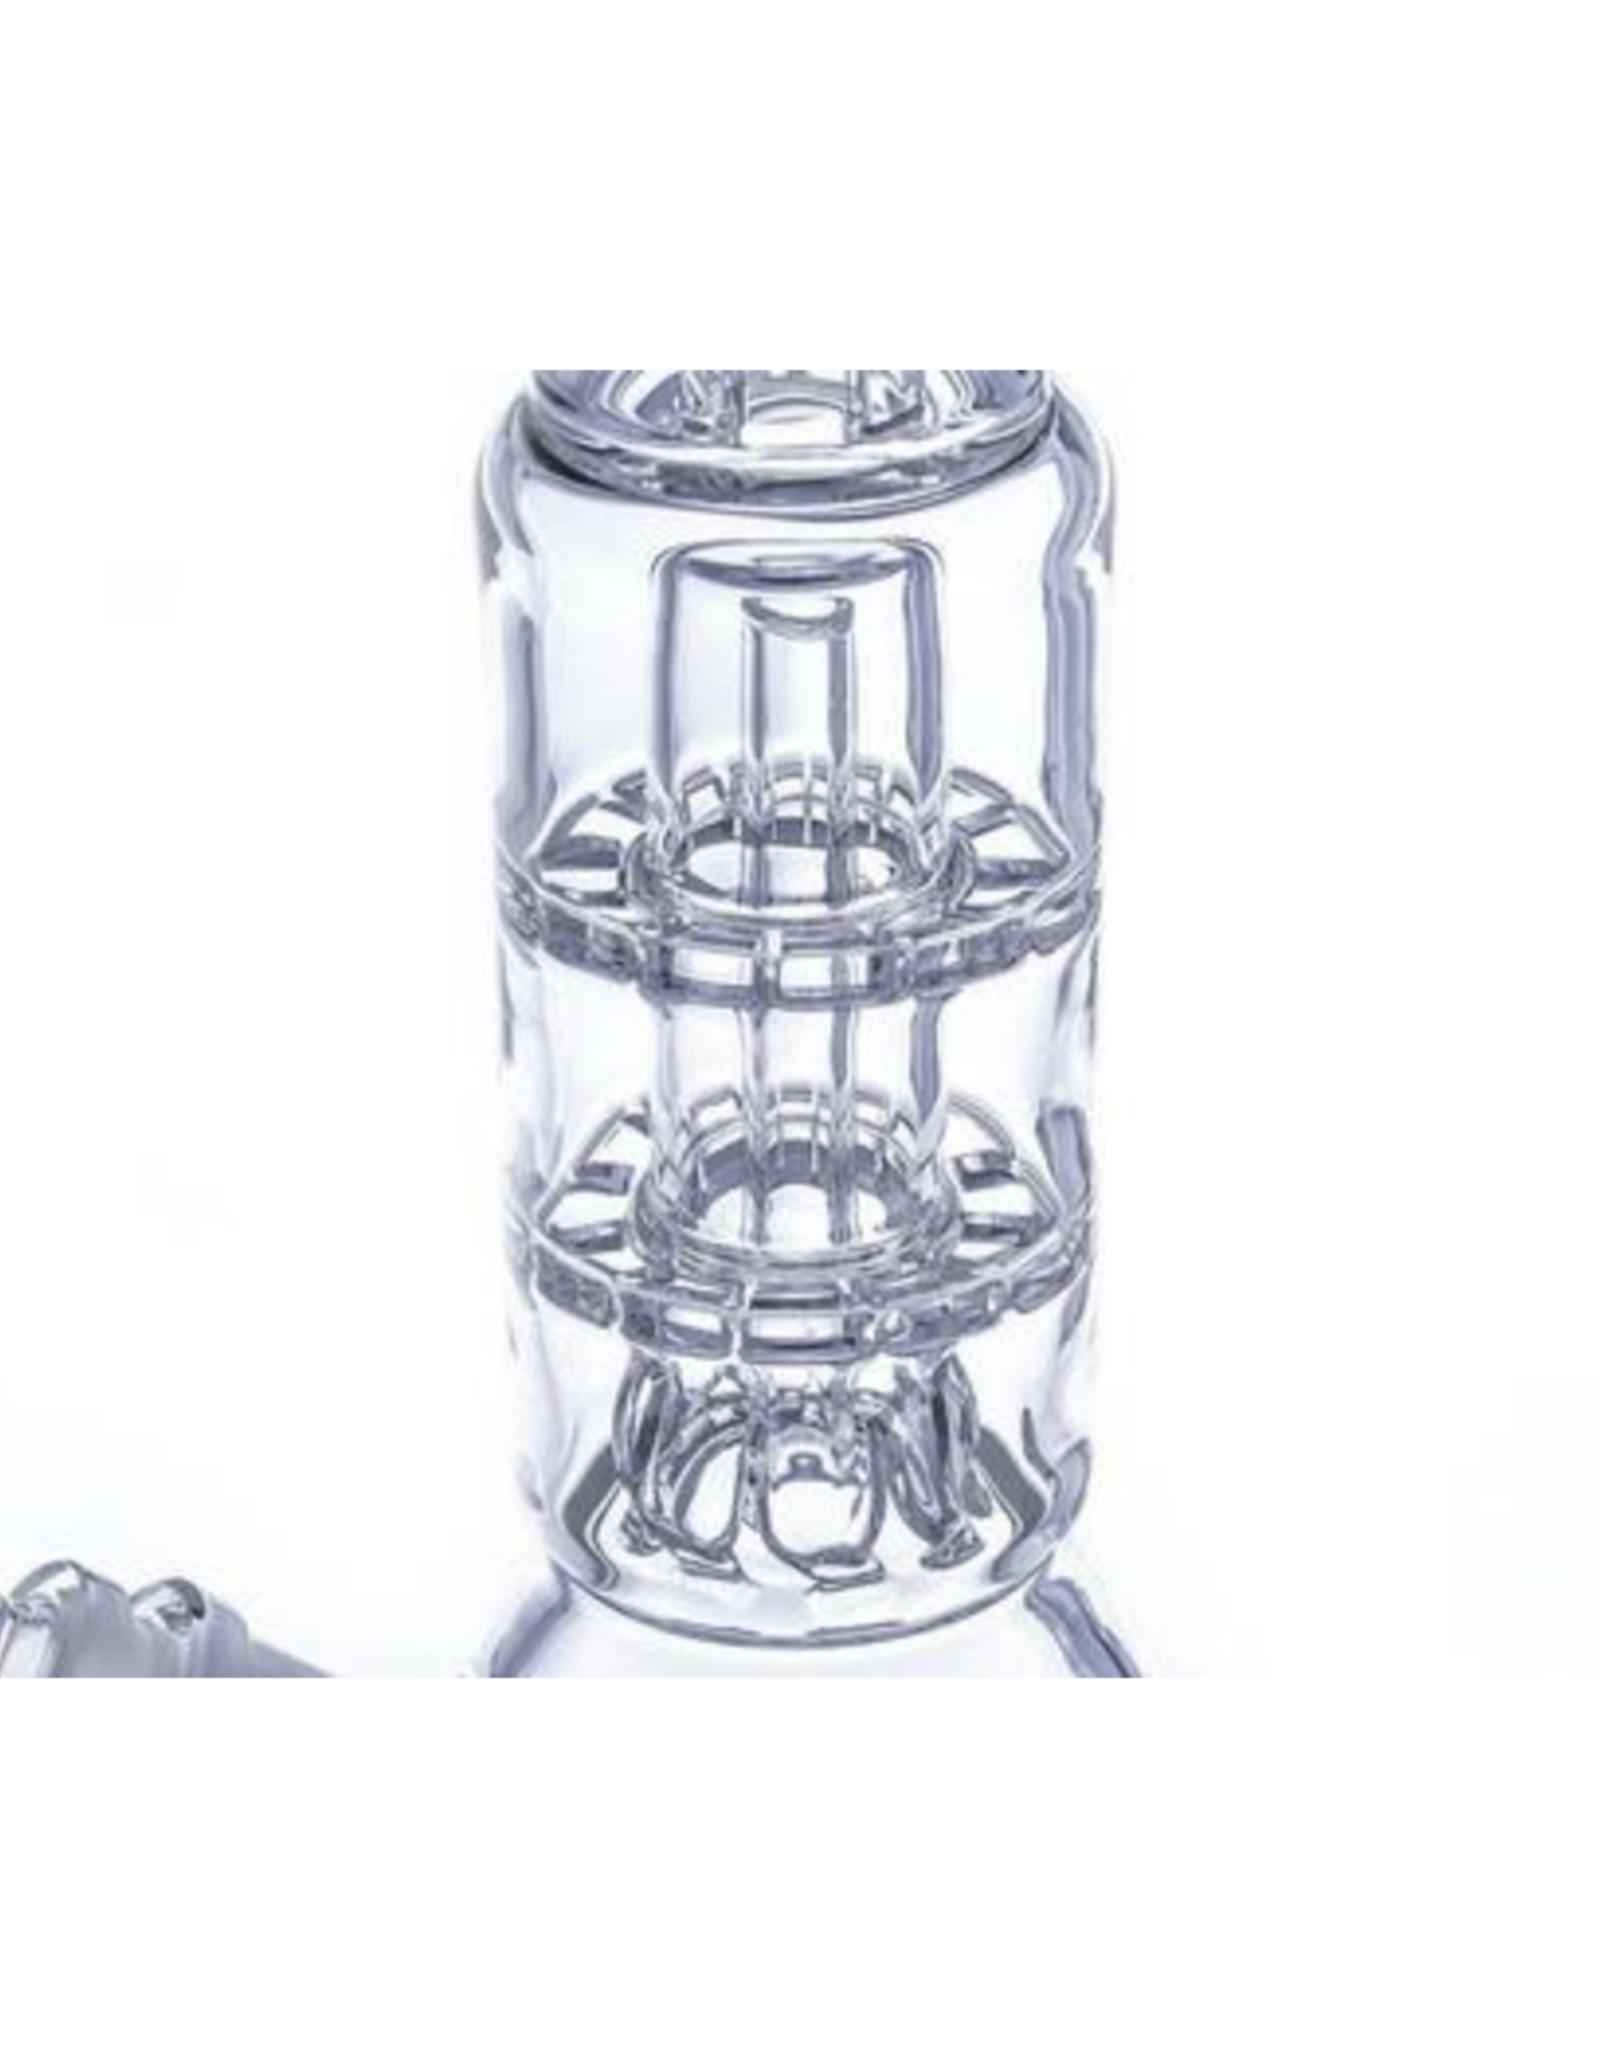 "Hoss 20"" Dome Perc Beaker by Hoss"